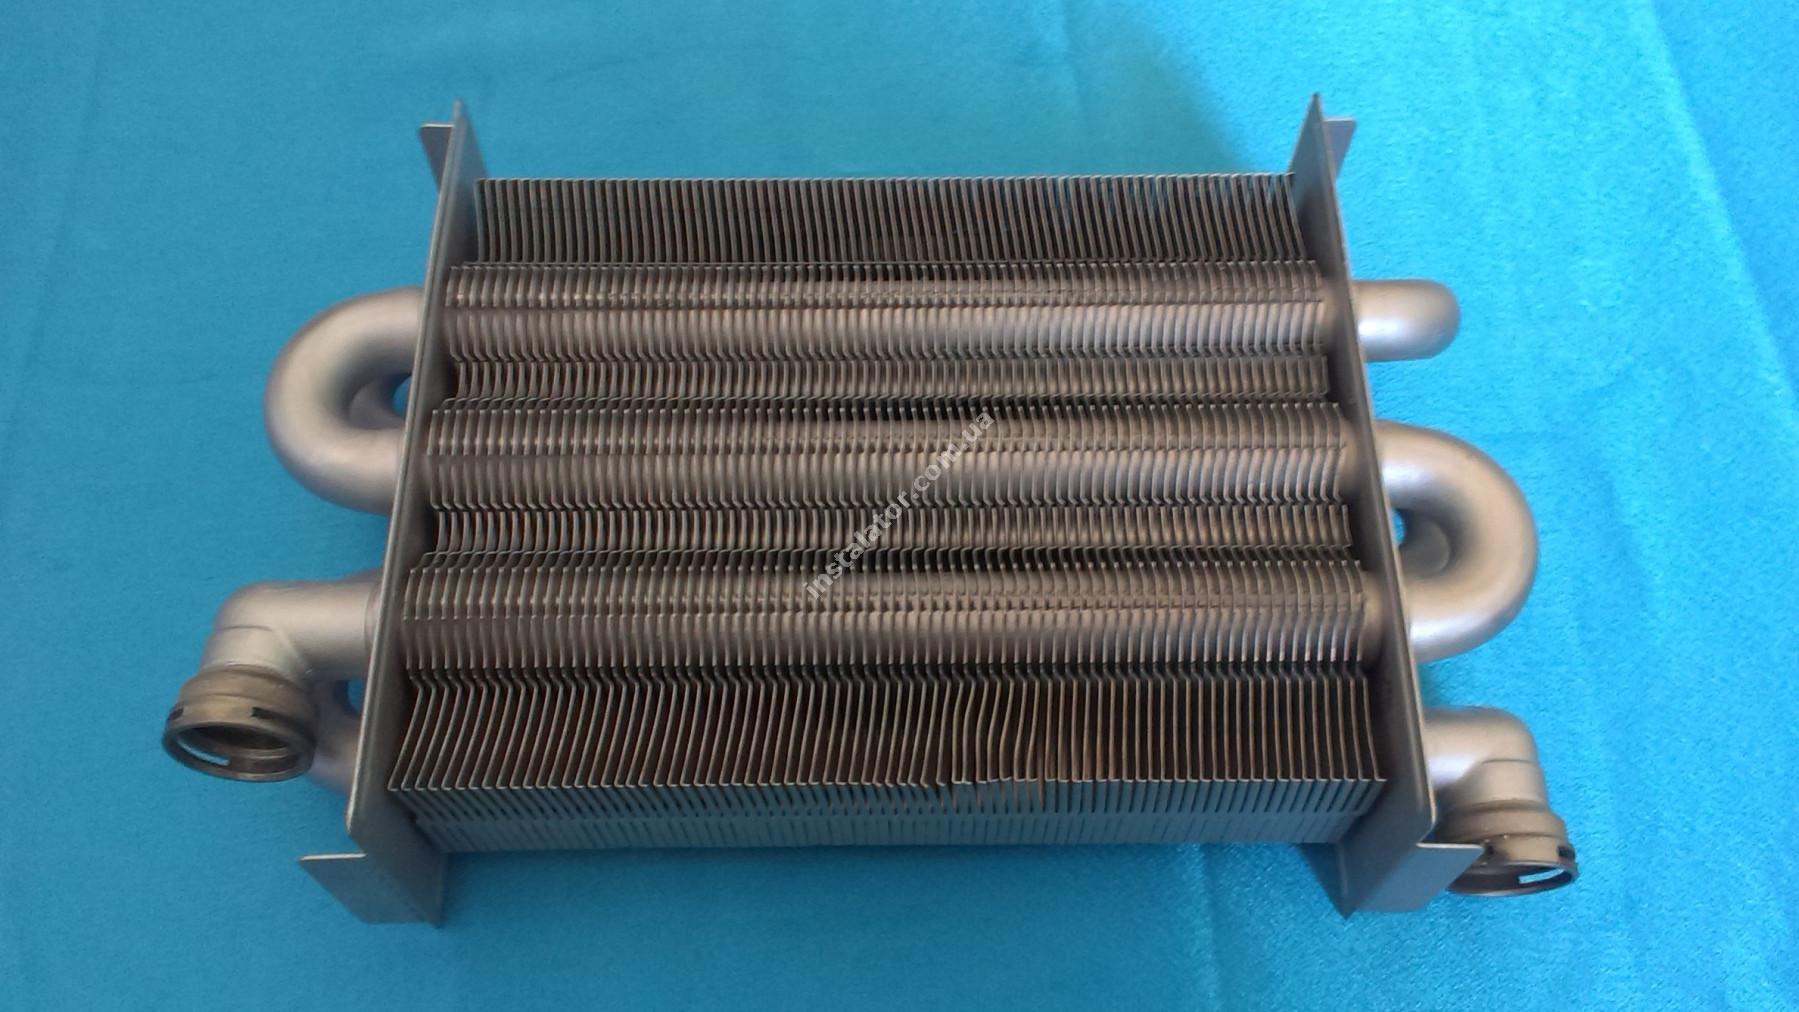 65100425 Теплообмінник первинний ARISTON Uno (турбо) full-image-2